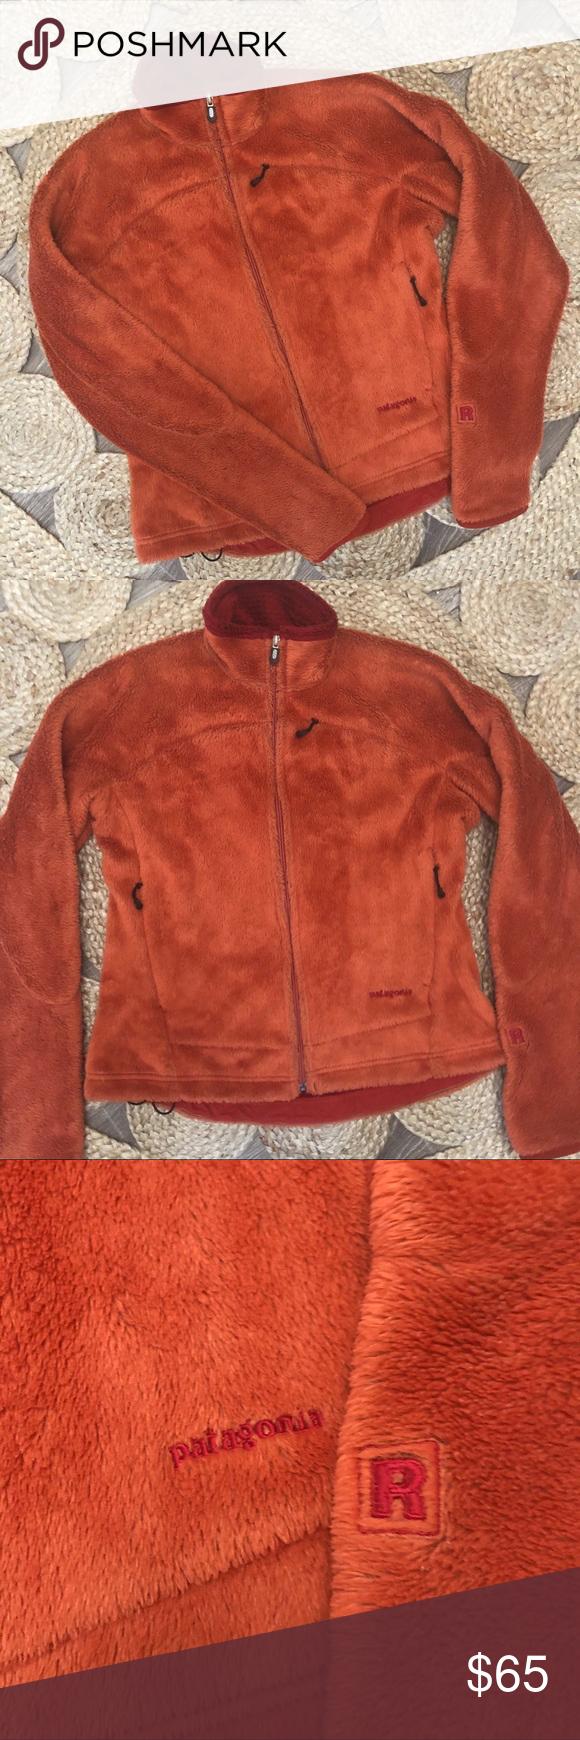 S vtg patagonia polartec fleece jacket my posh closet